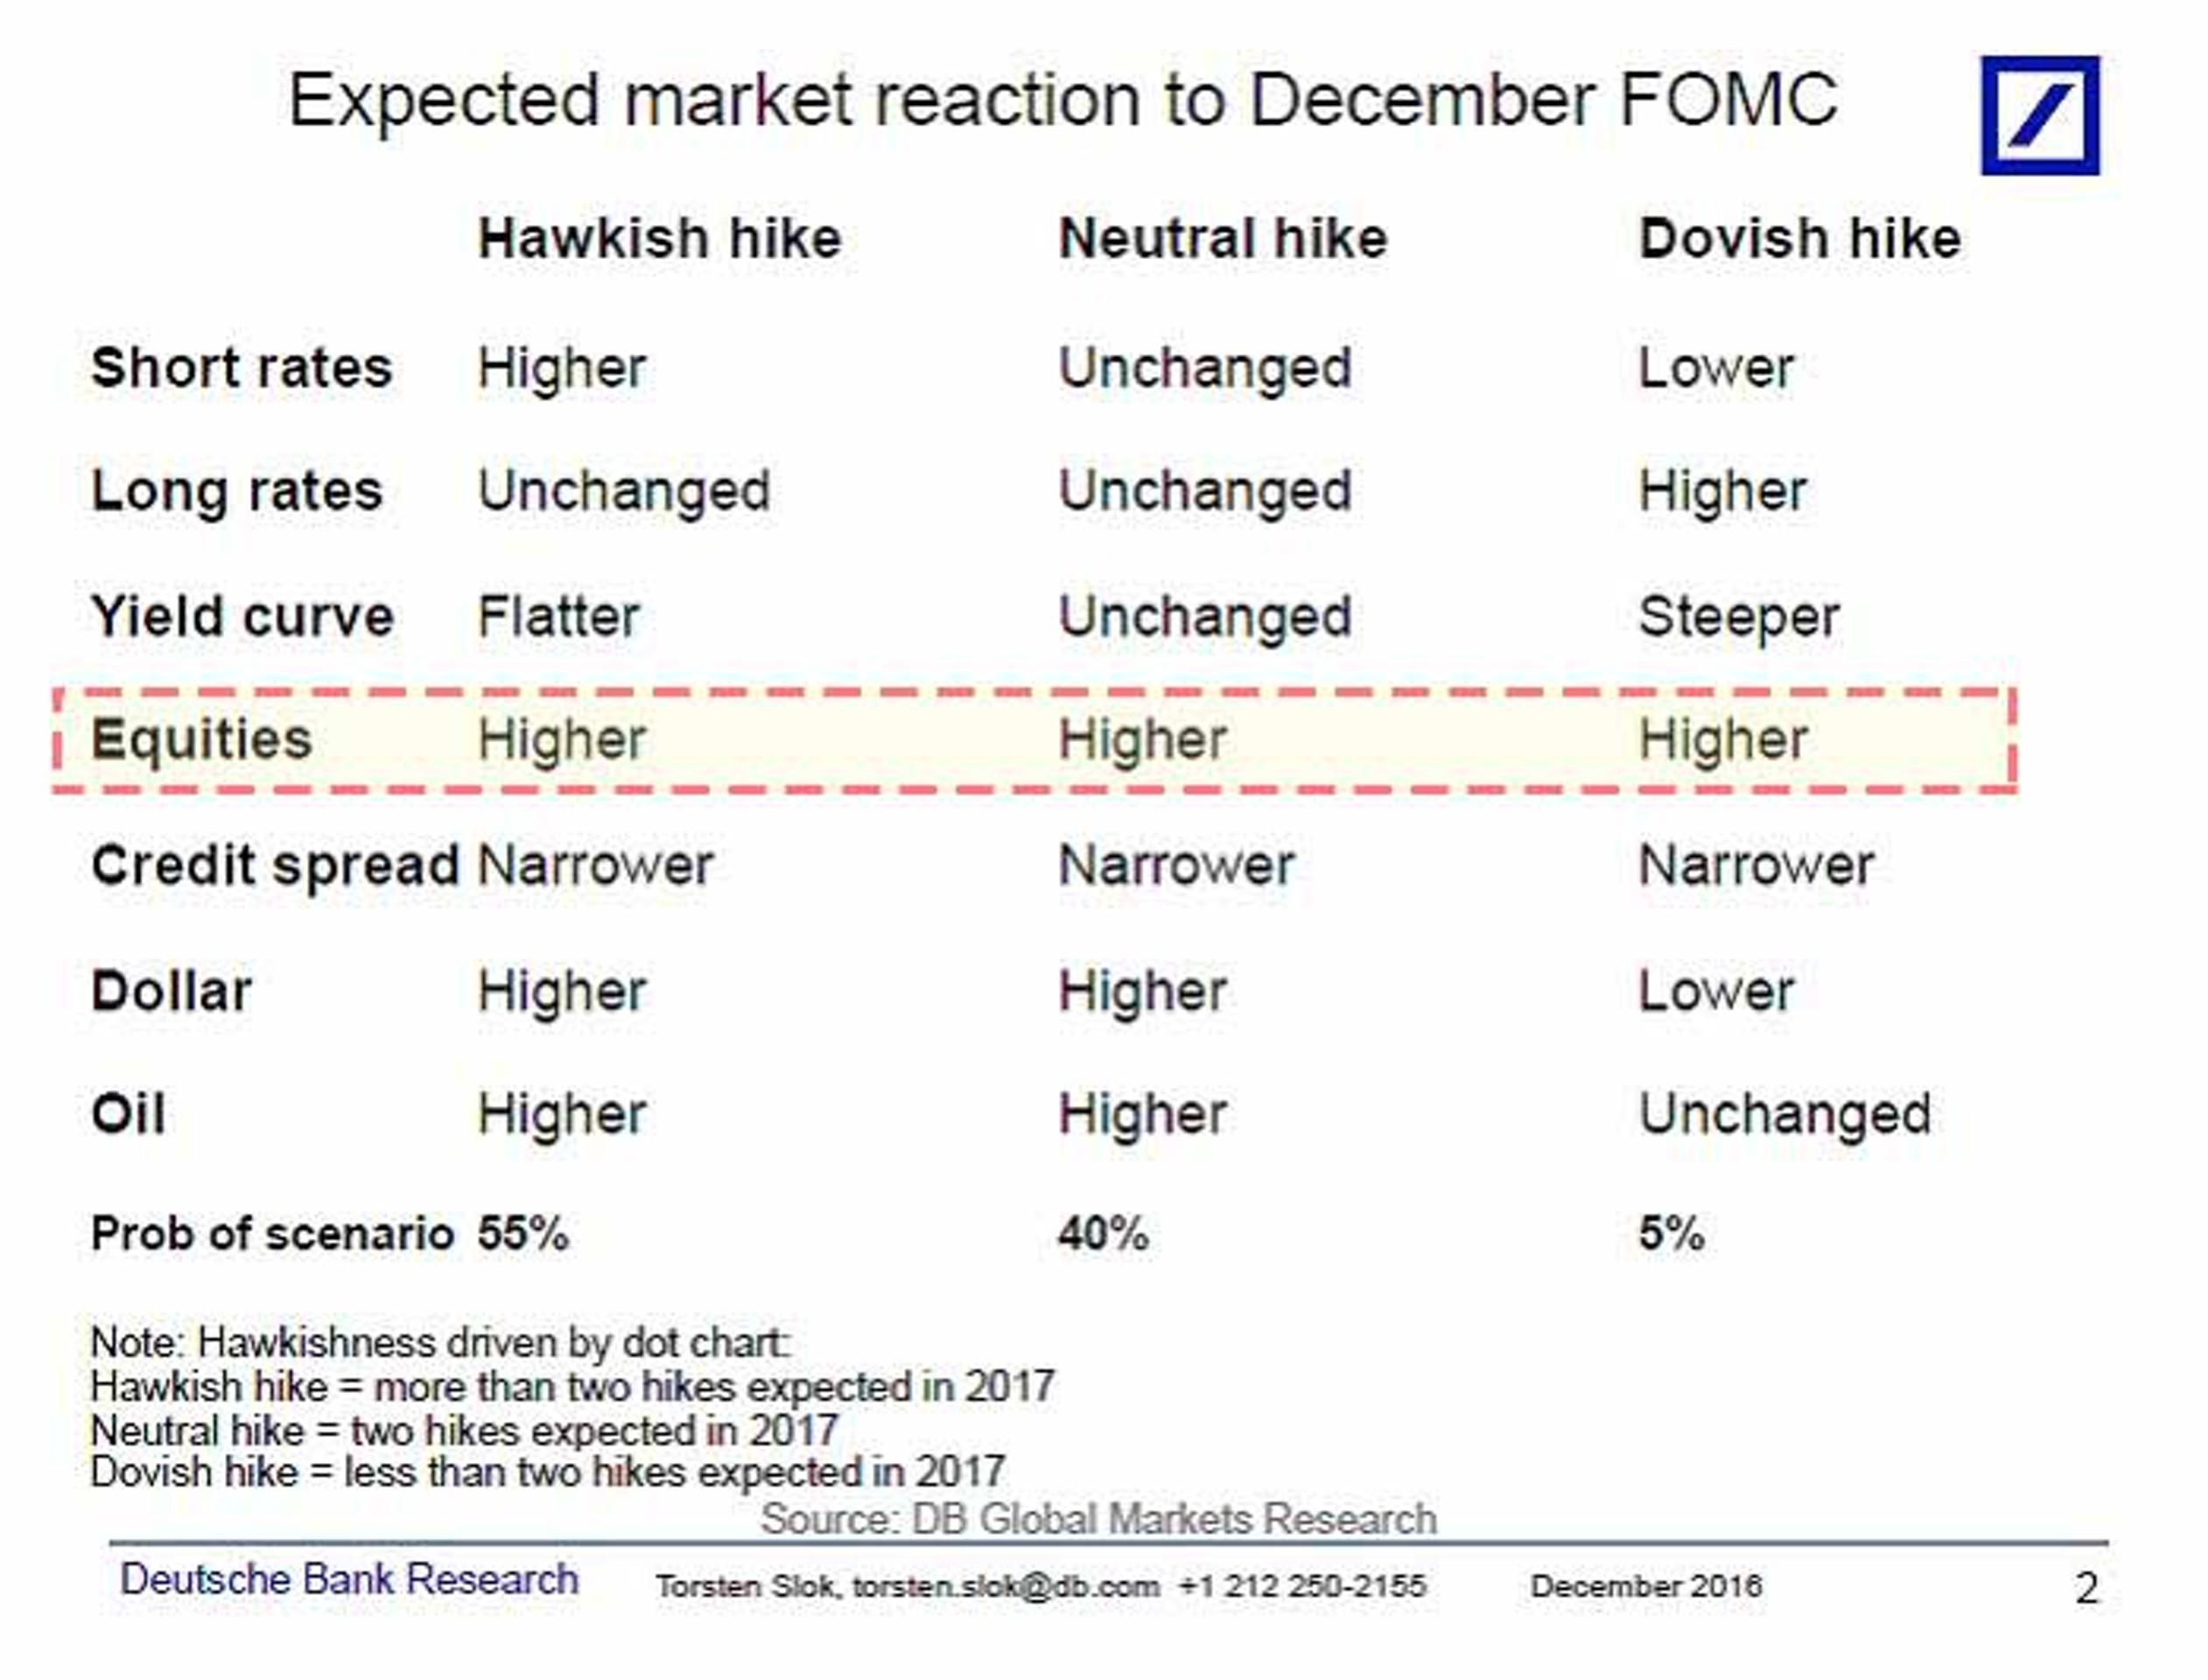 Как отреагирует рынок на решение ФРС?